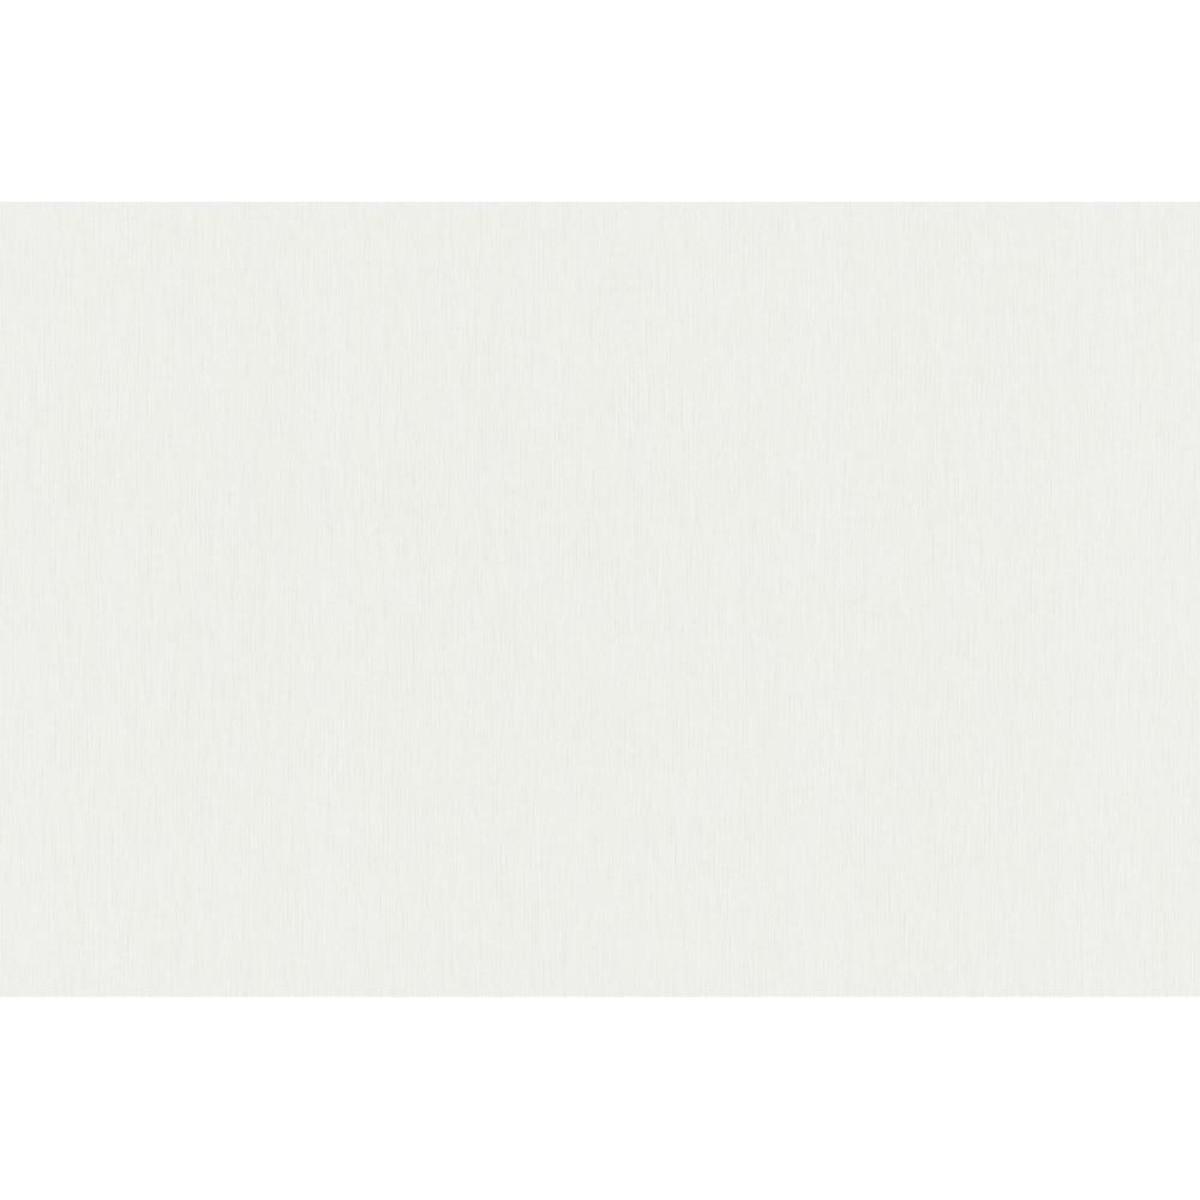 Обои флизелиновые Maxwall белые 1.06 м 168147-10